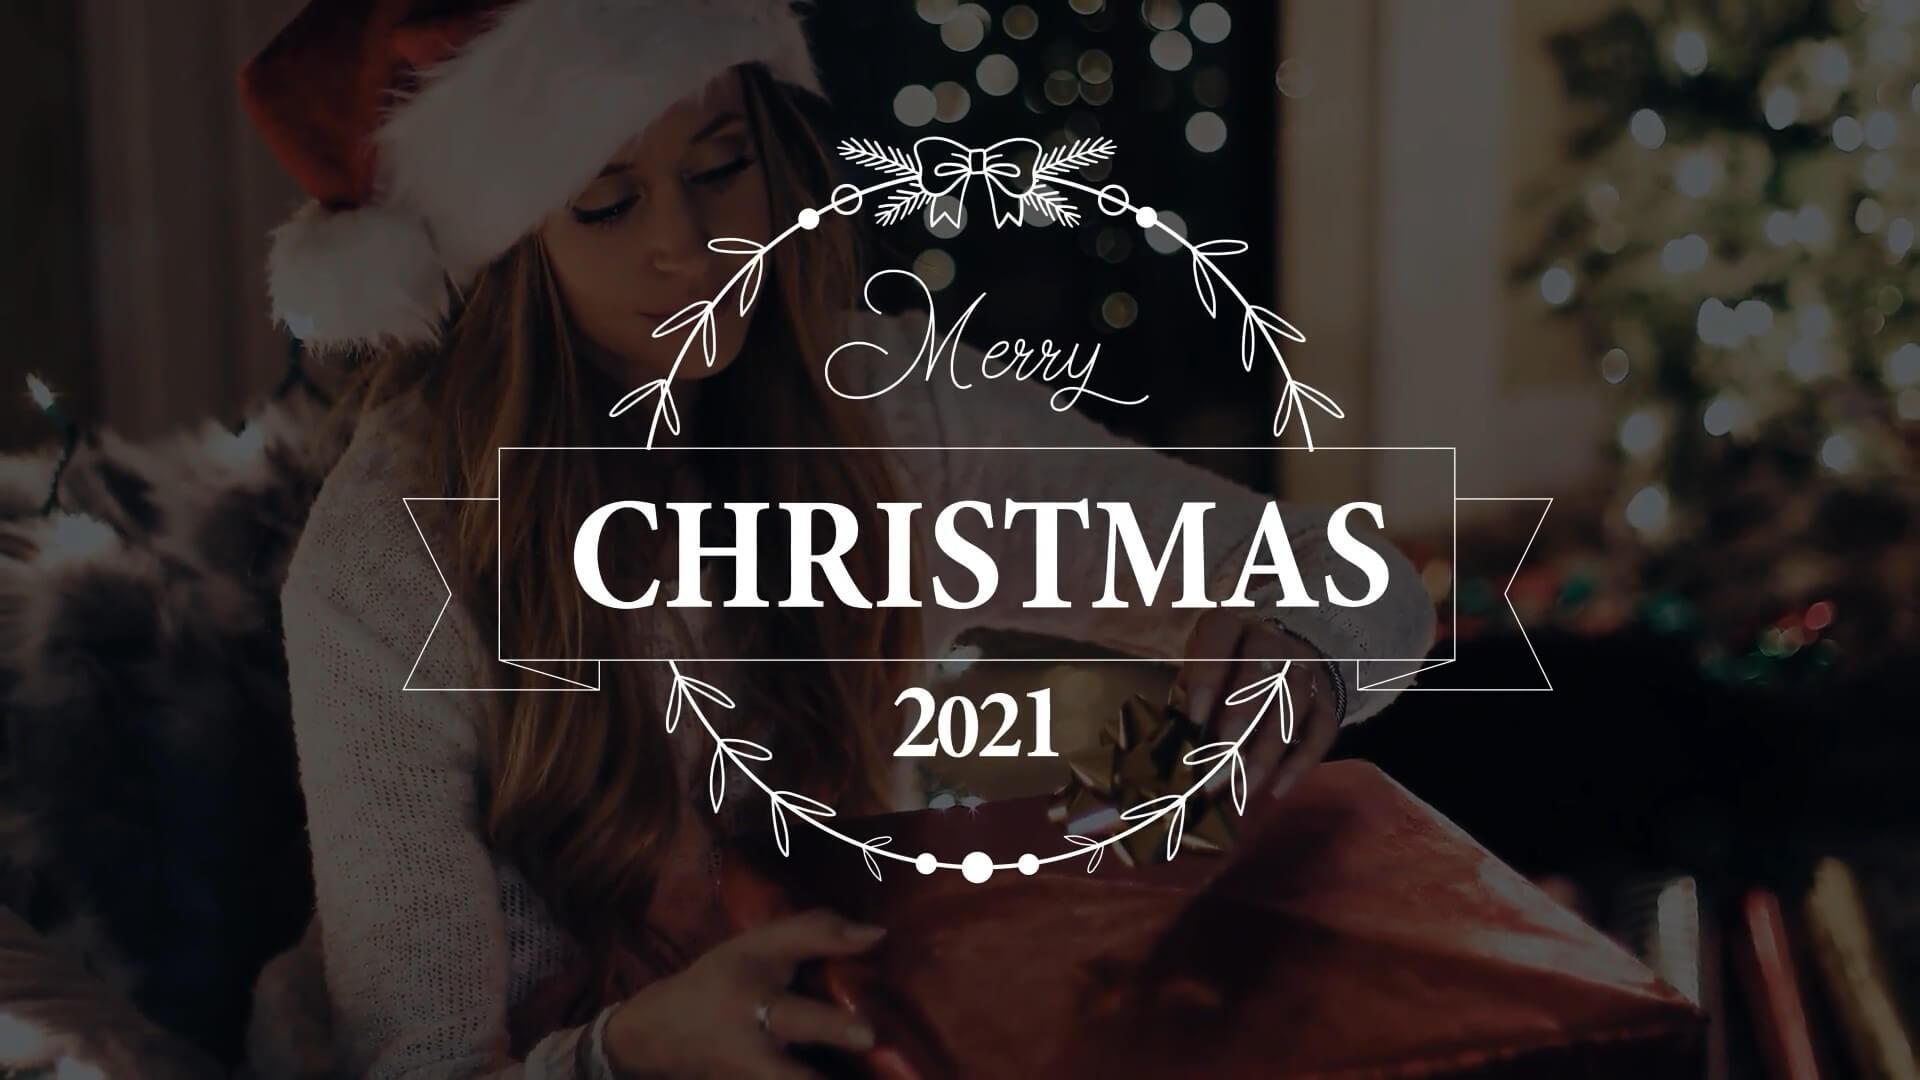 fcpx插件 10组2021年圣诞节新年标题动画模板 Christmas Titles